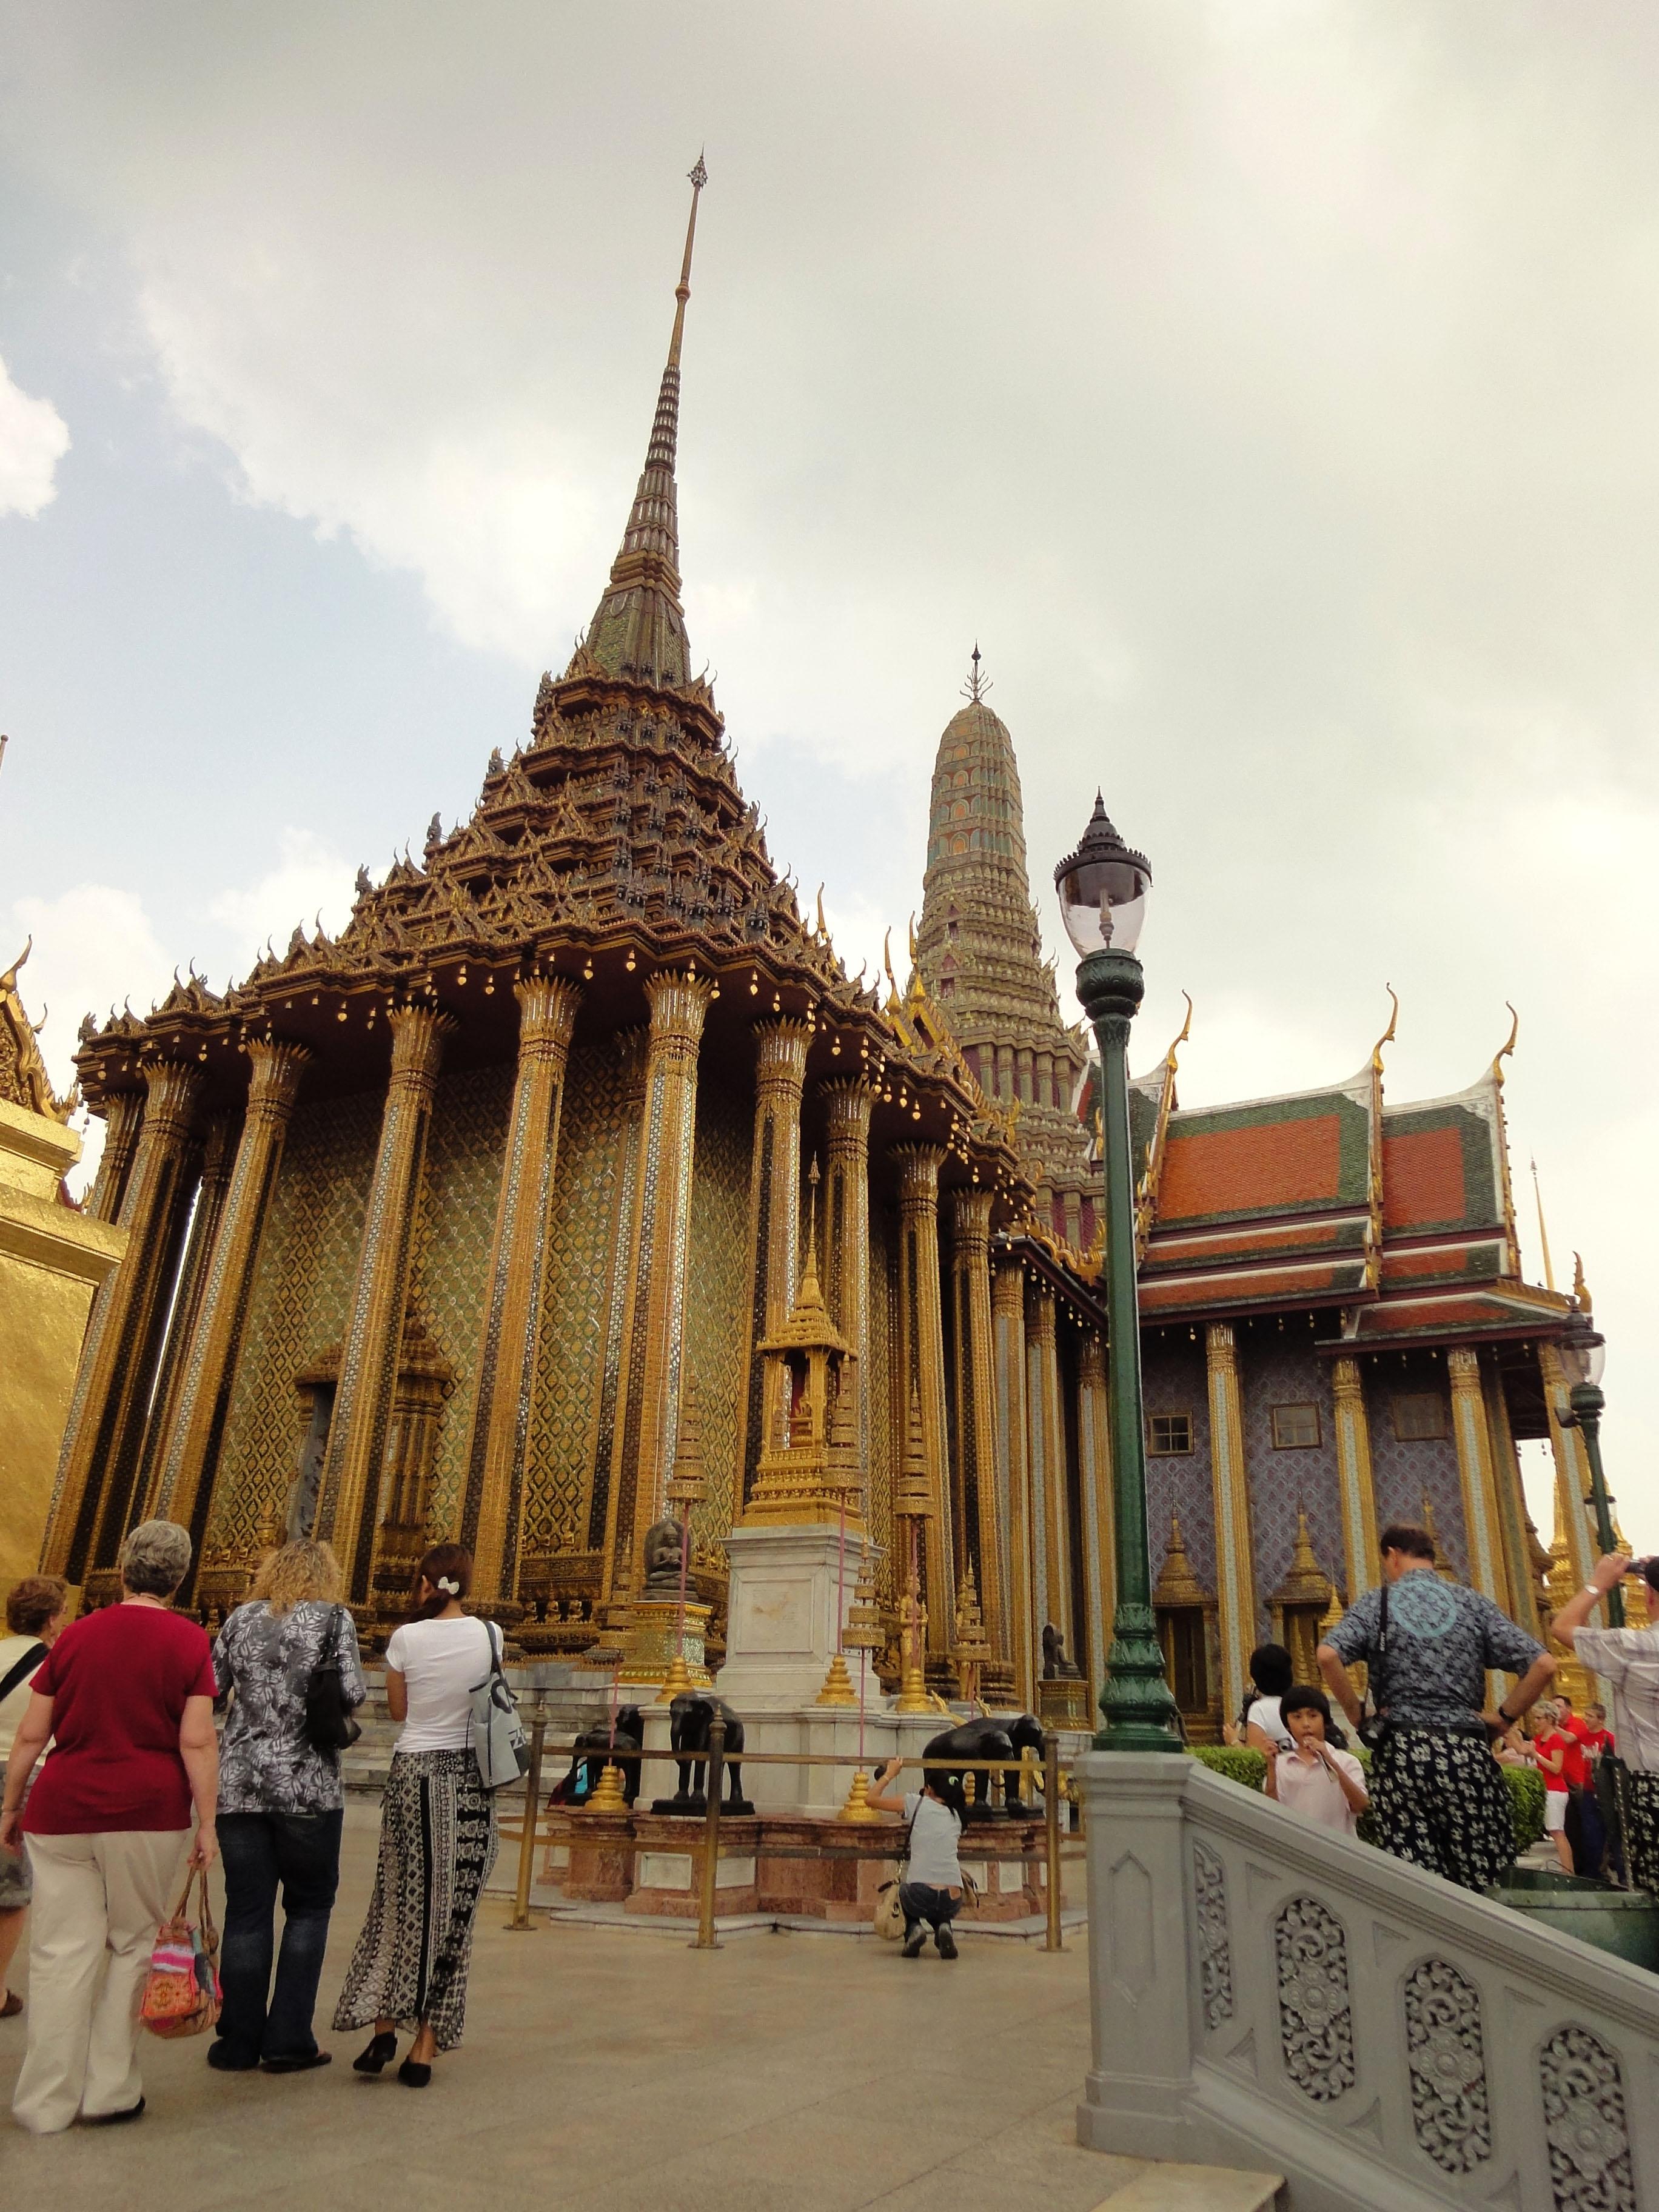 07 Phra Mondop Grand Palace Bangkok 2010 02